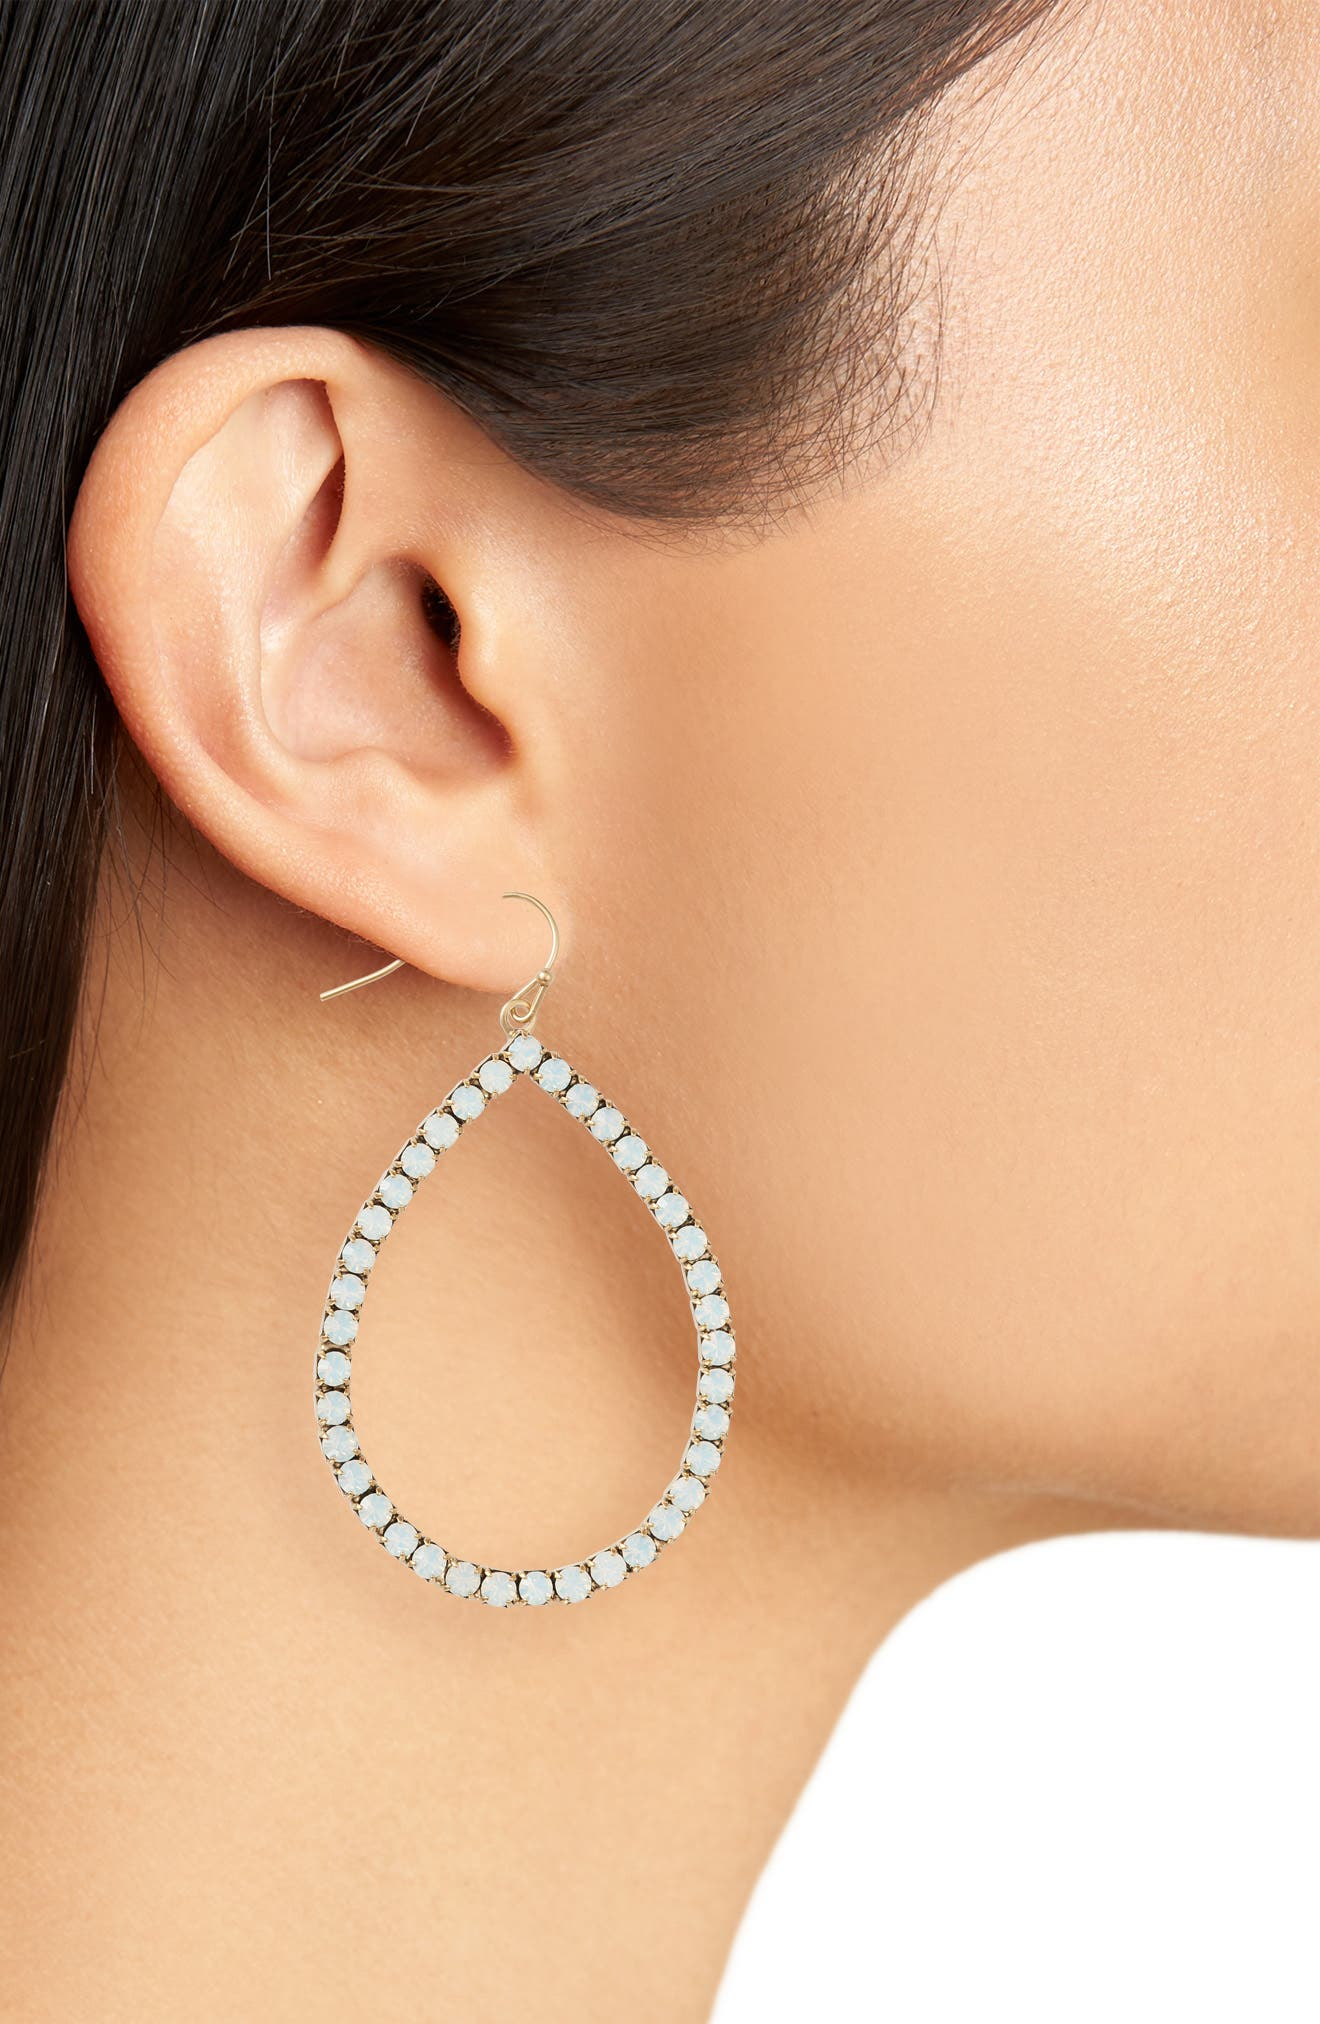 Emilia Crystal Teardrop Earrings,                             Alternate thumbnail 2, color,                             White